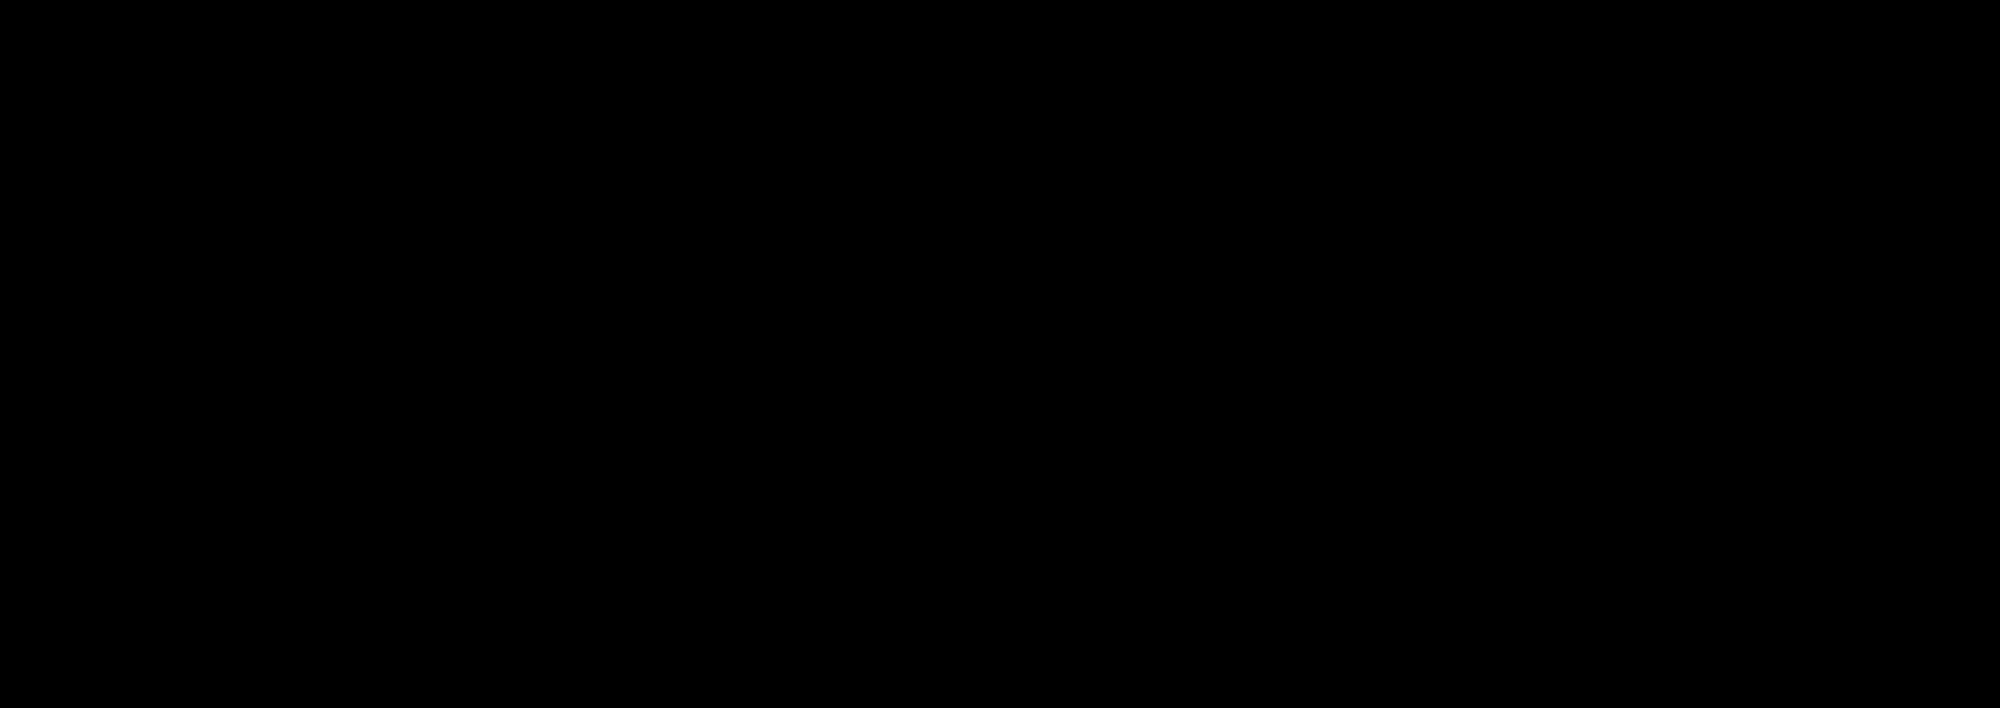 METAPHYSICAL MEATHEAD-logo (1).png